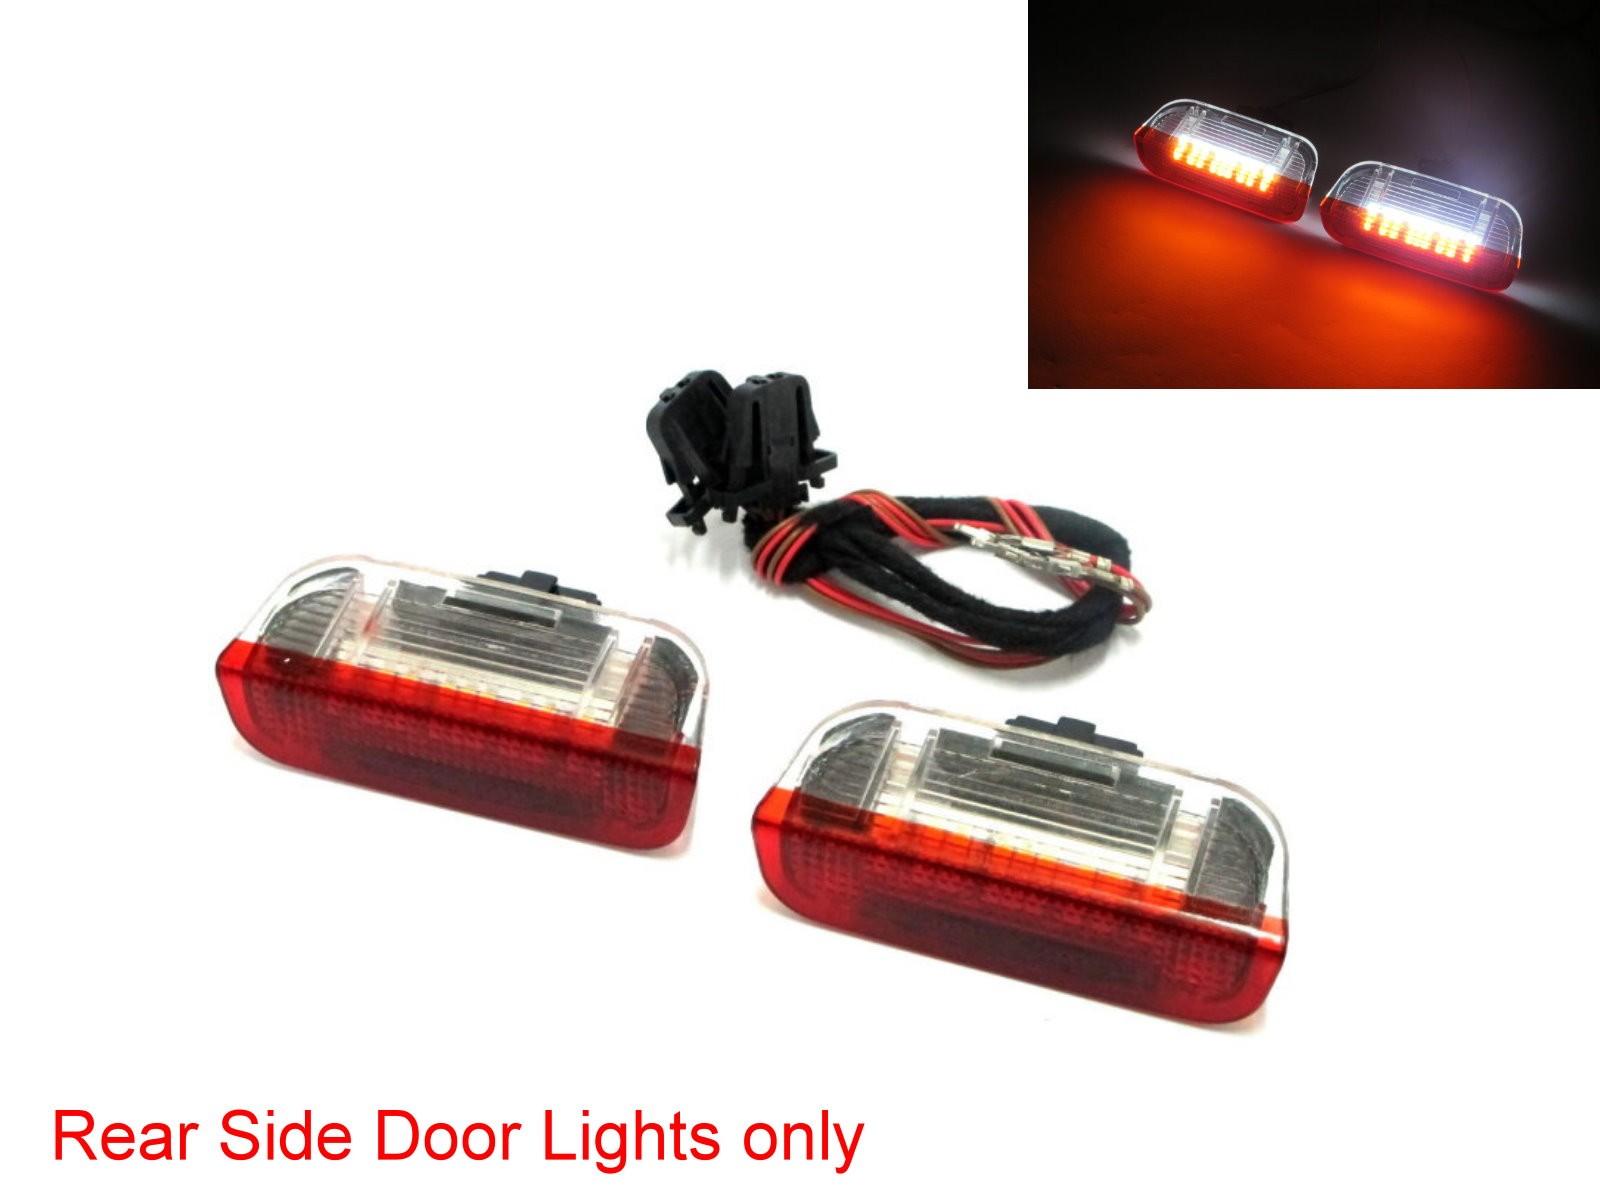 CrazyTheGod Panamera 2010-Present SUV 5D LED Courtesy Side Door Light Red/White V2 for PORSCHE